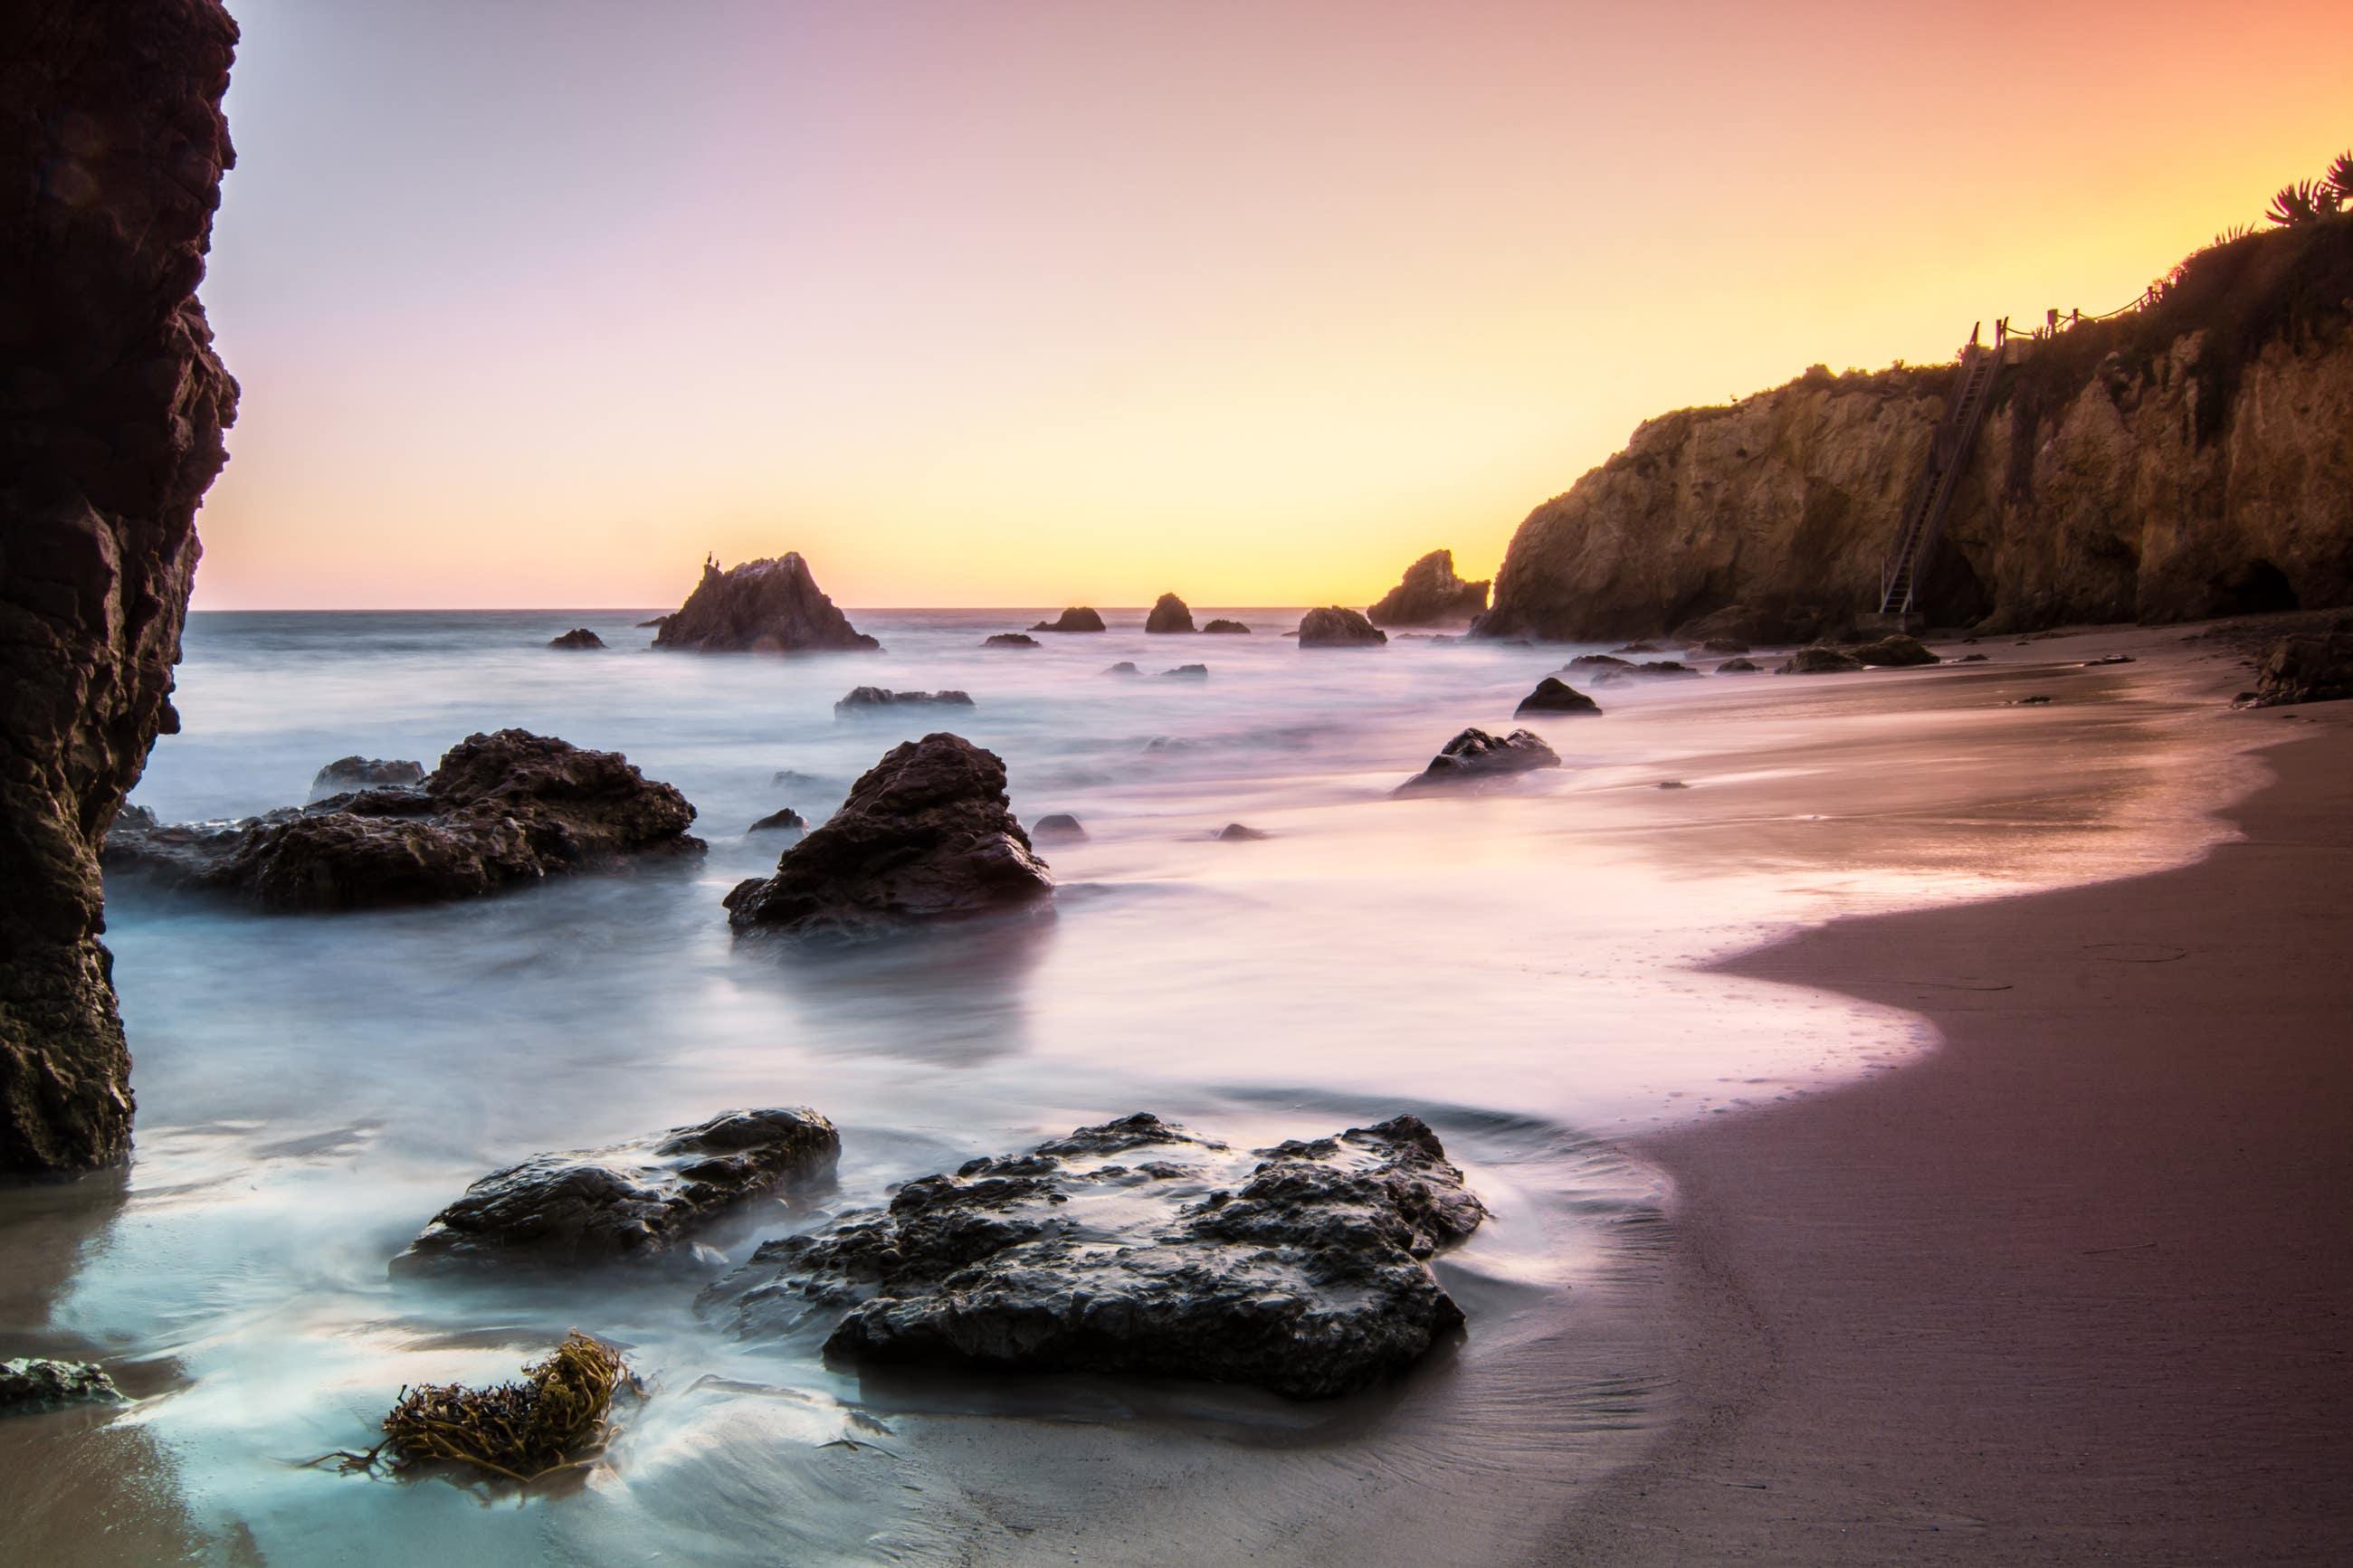 Sunset at El Matador State Beach